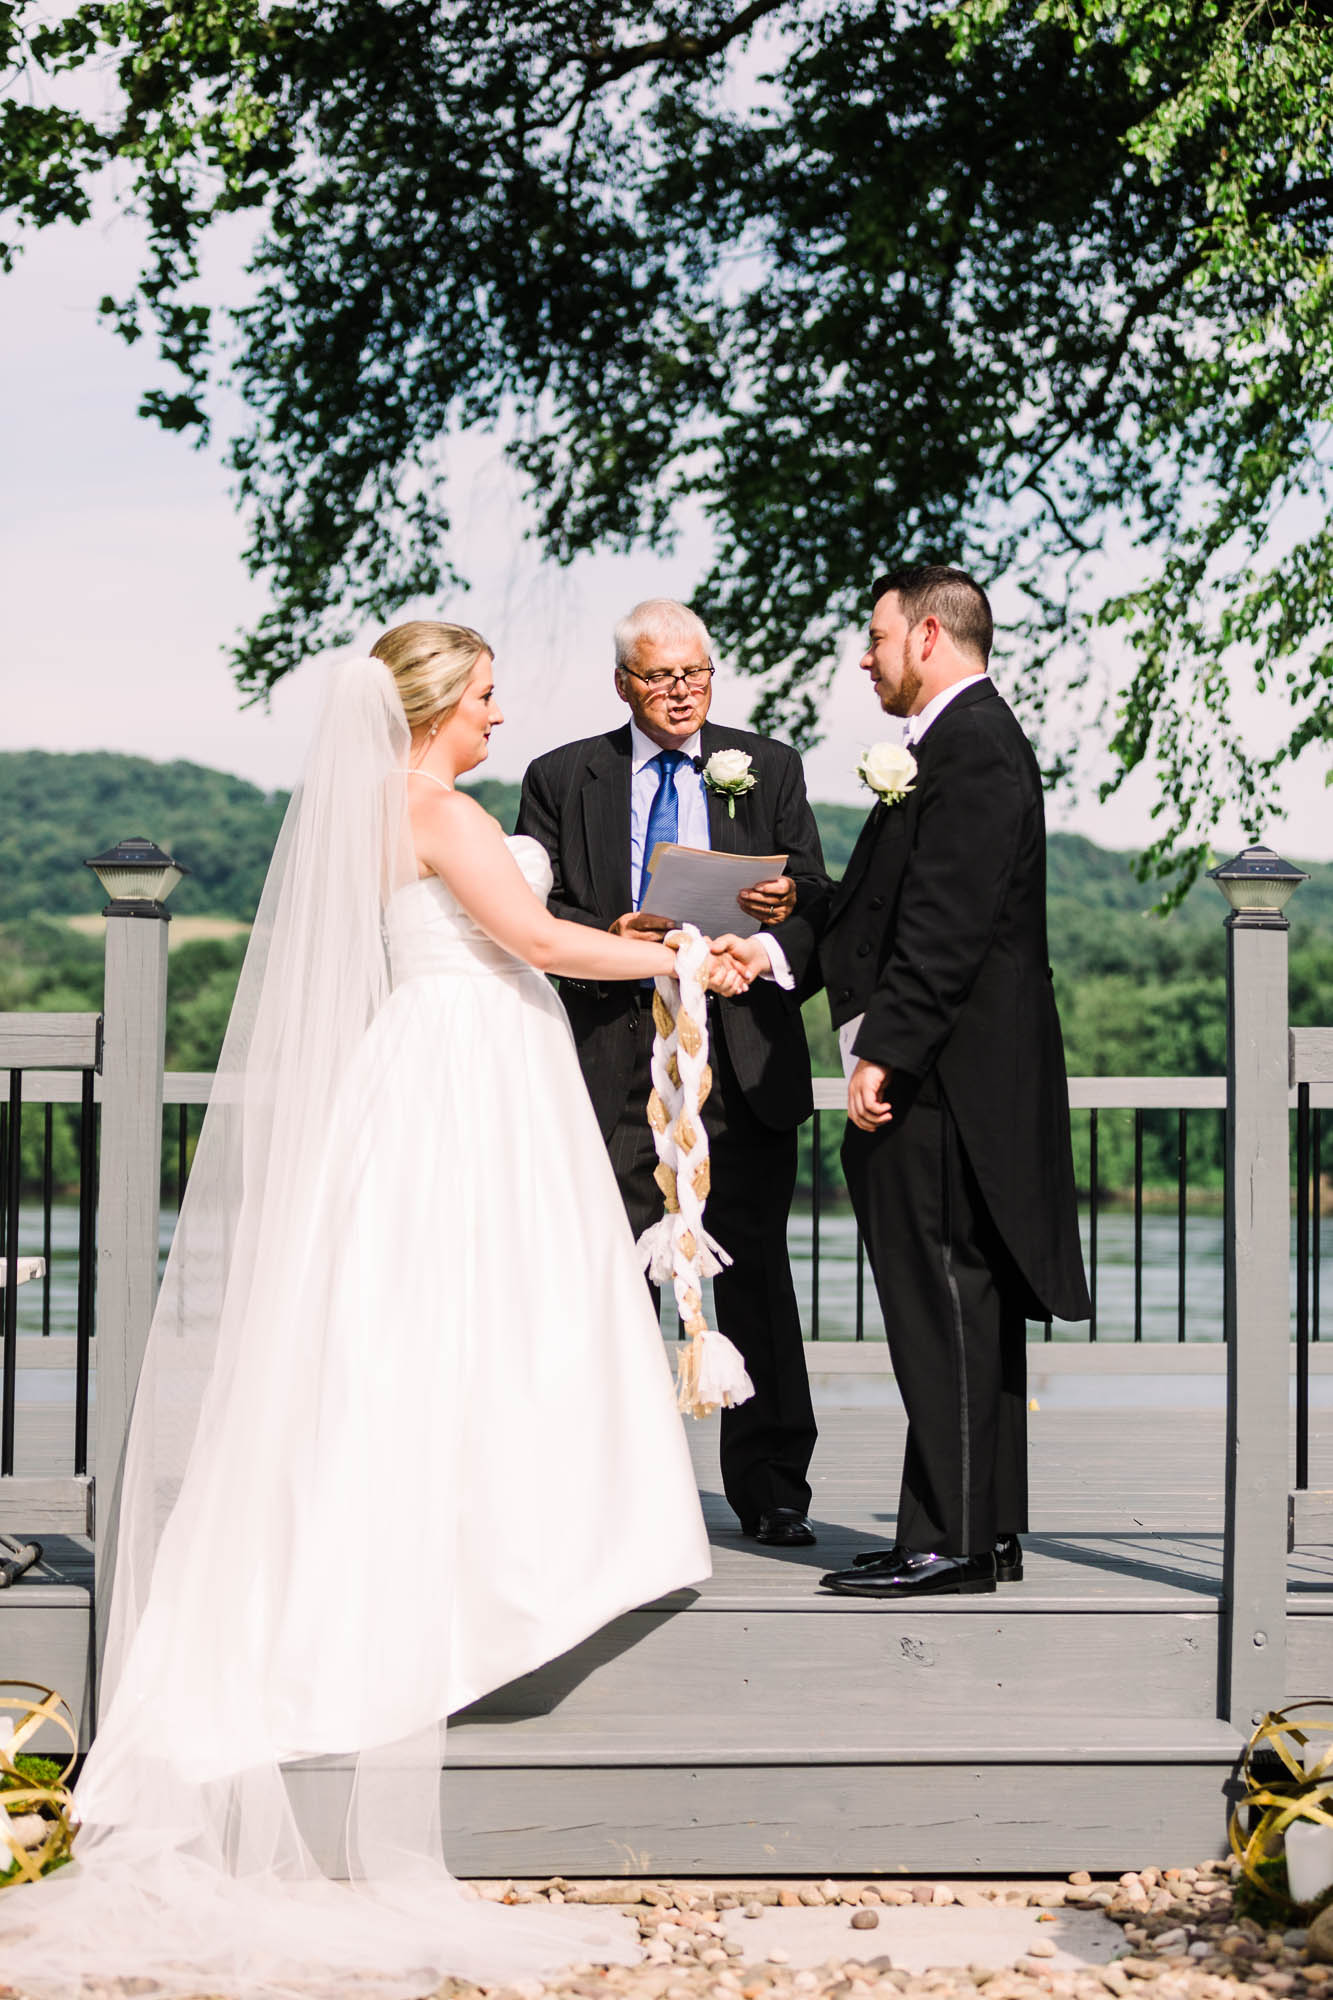 isle-of-que-wedding-3862.jpg